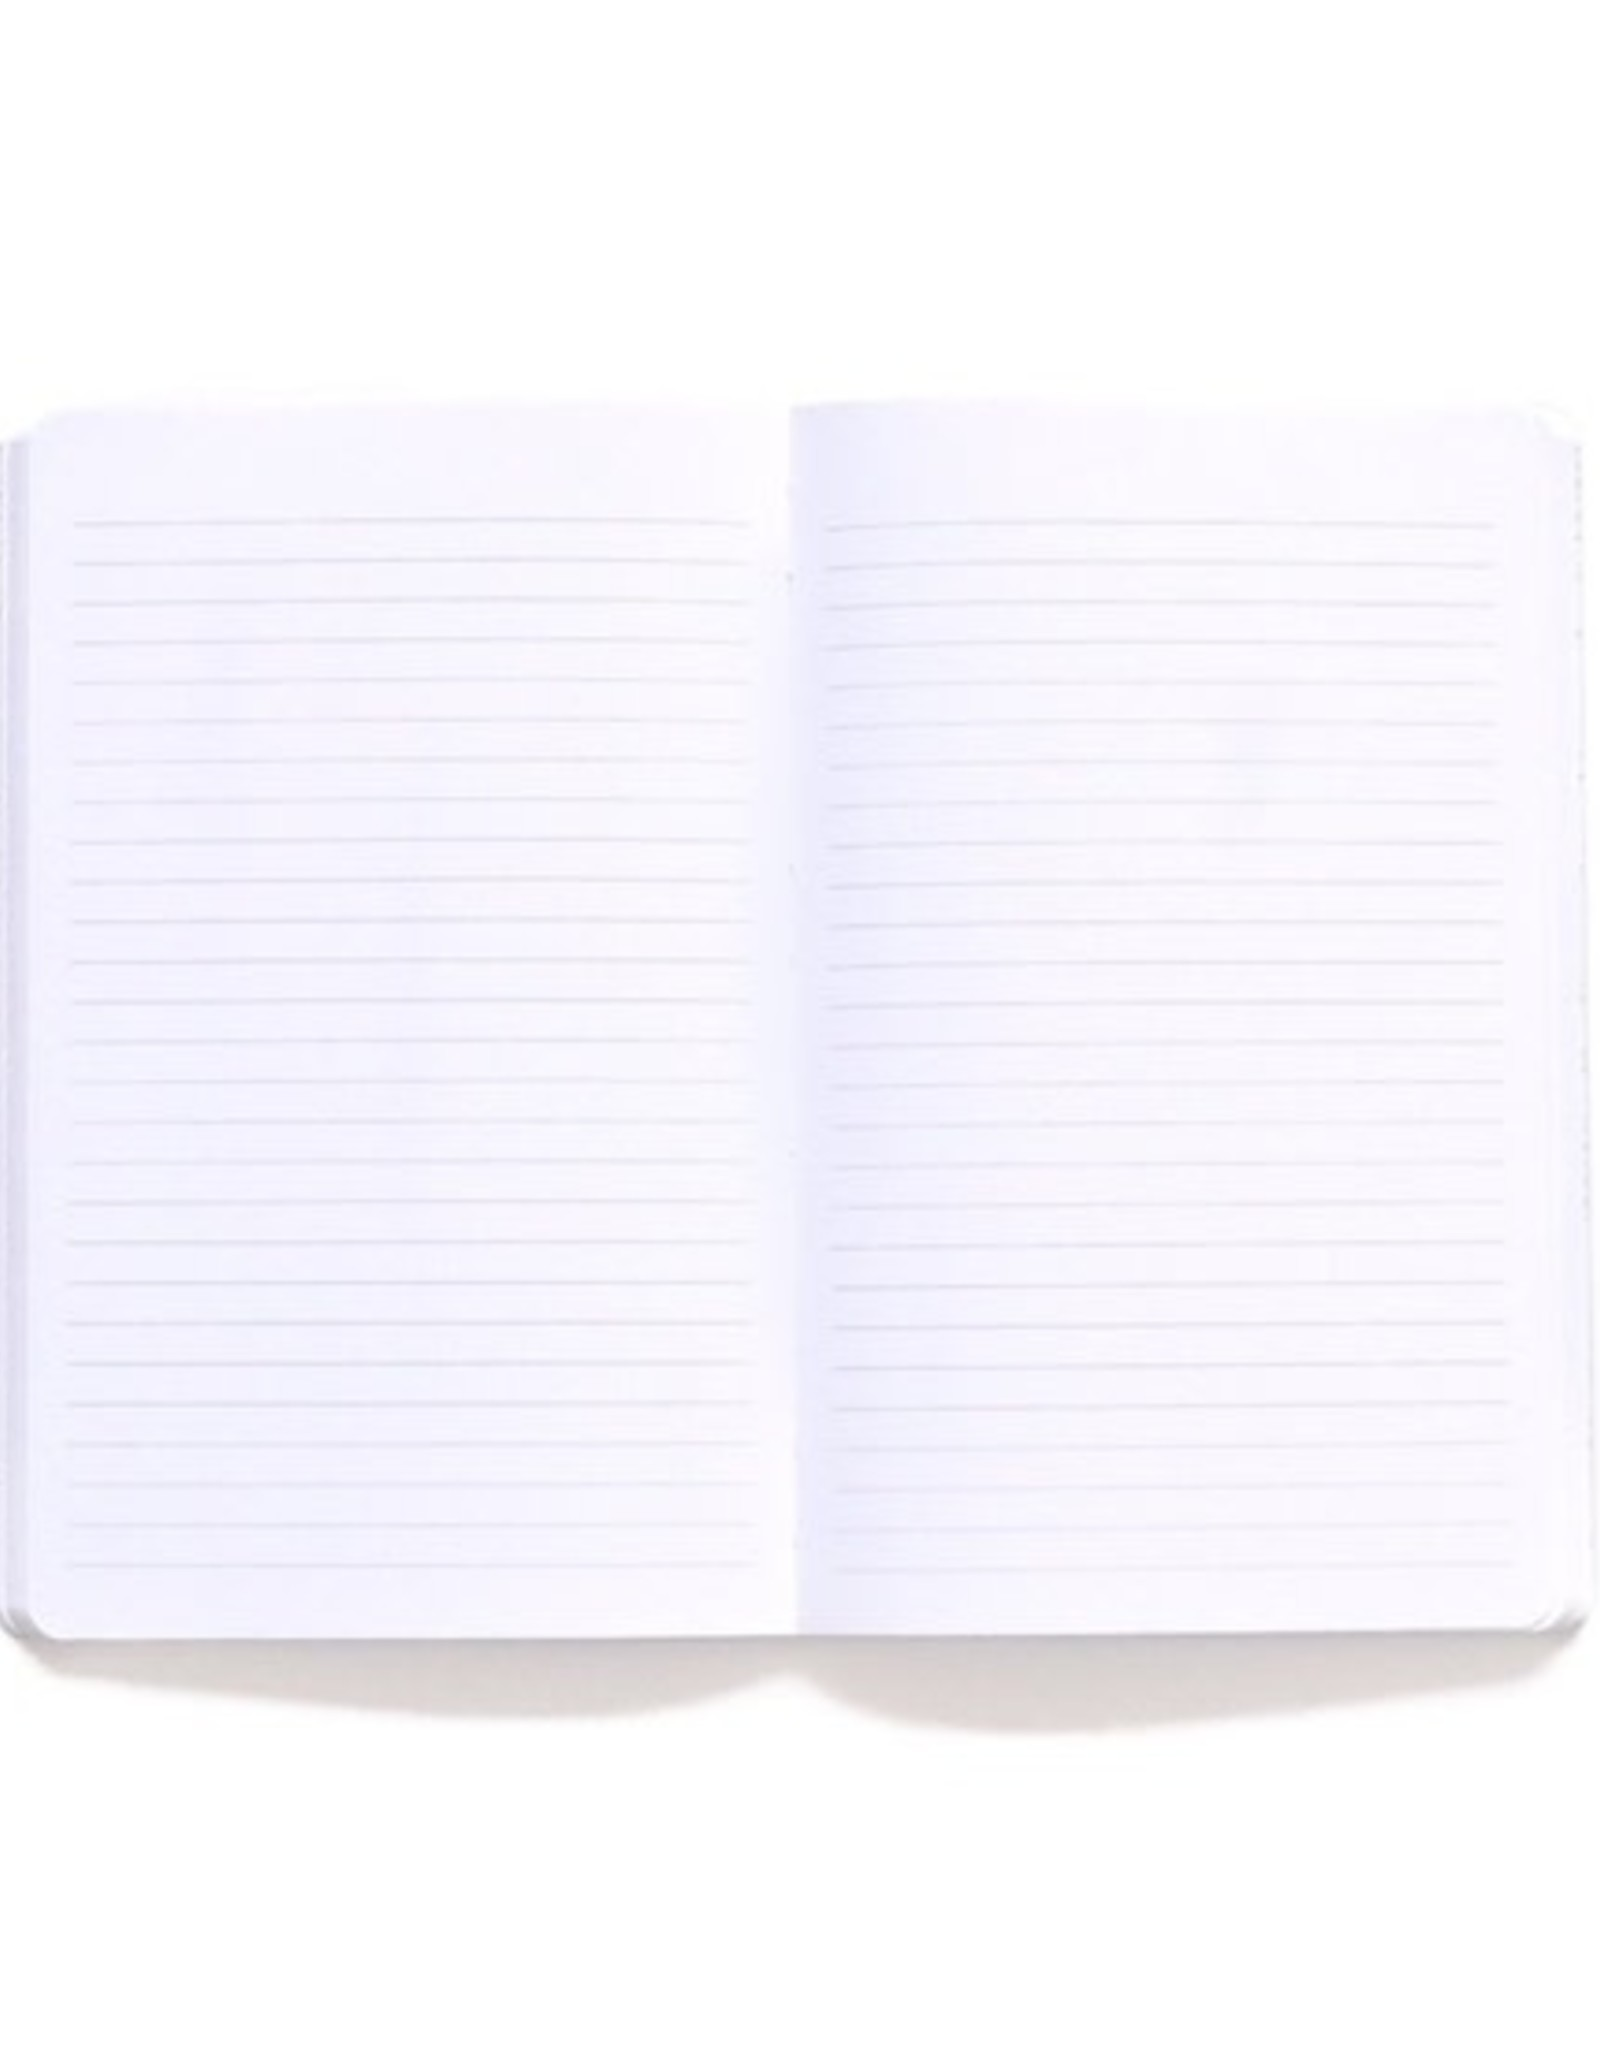 Denik Serenity Notebook